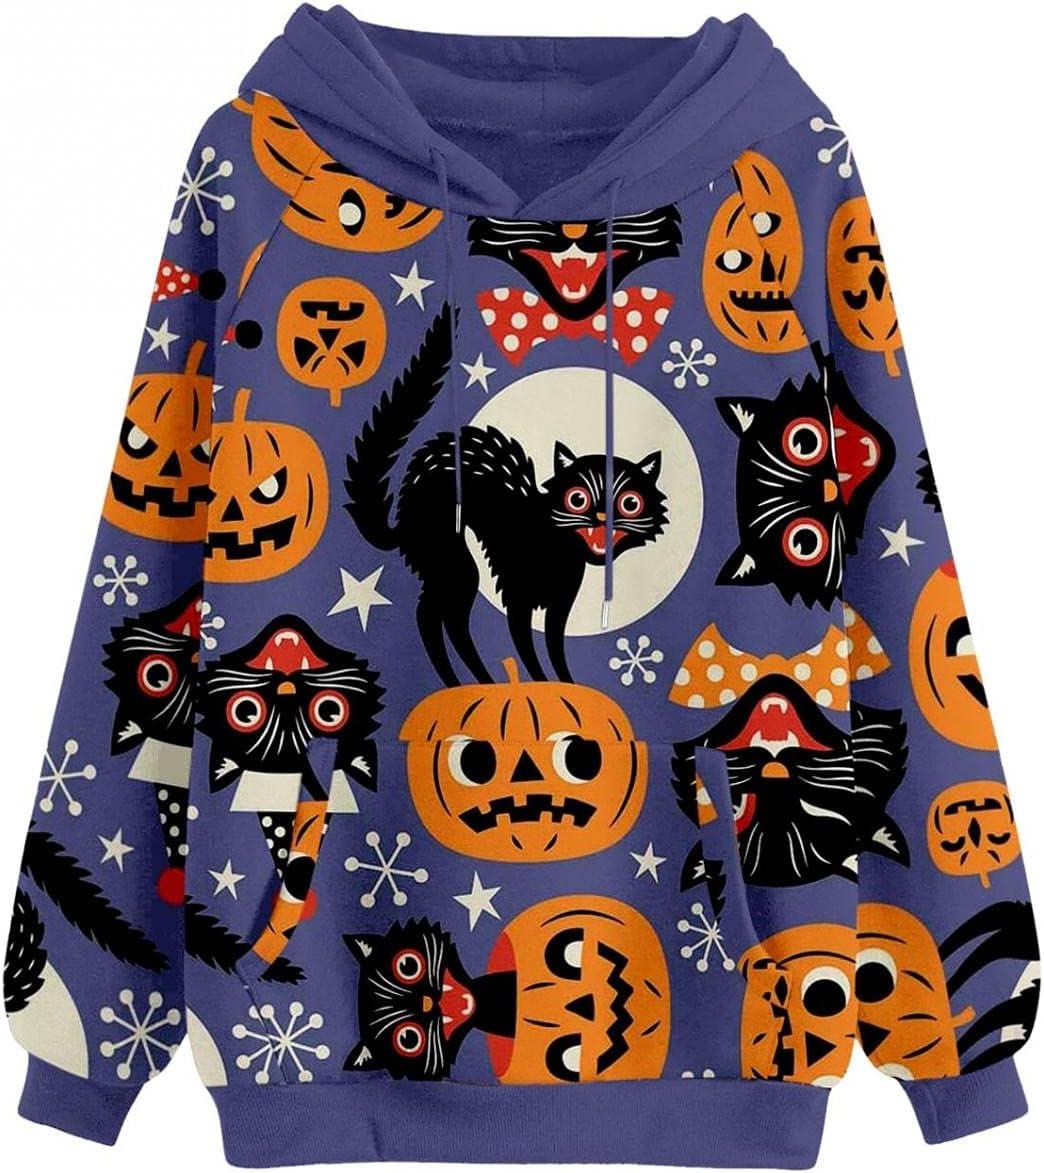 Women's Tops Sweatshirt Tshirt Max 80% OFF Free shipping Pumpkin Black Small Hallowe Cats